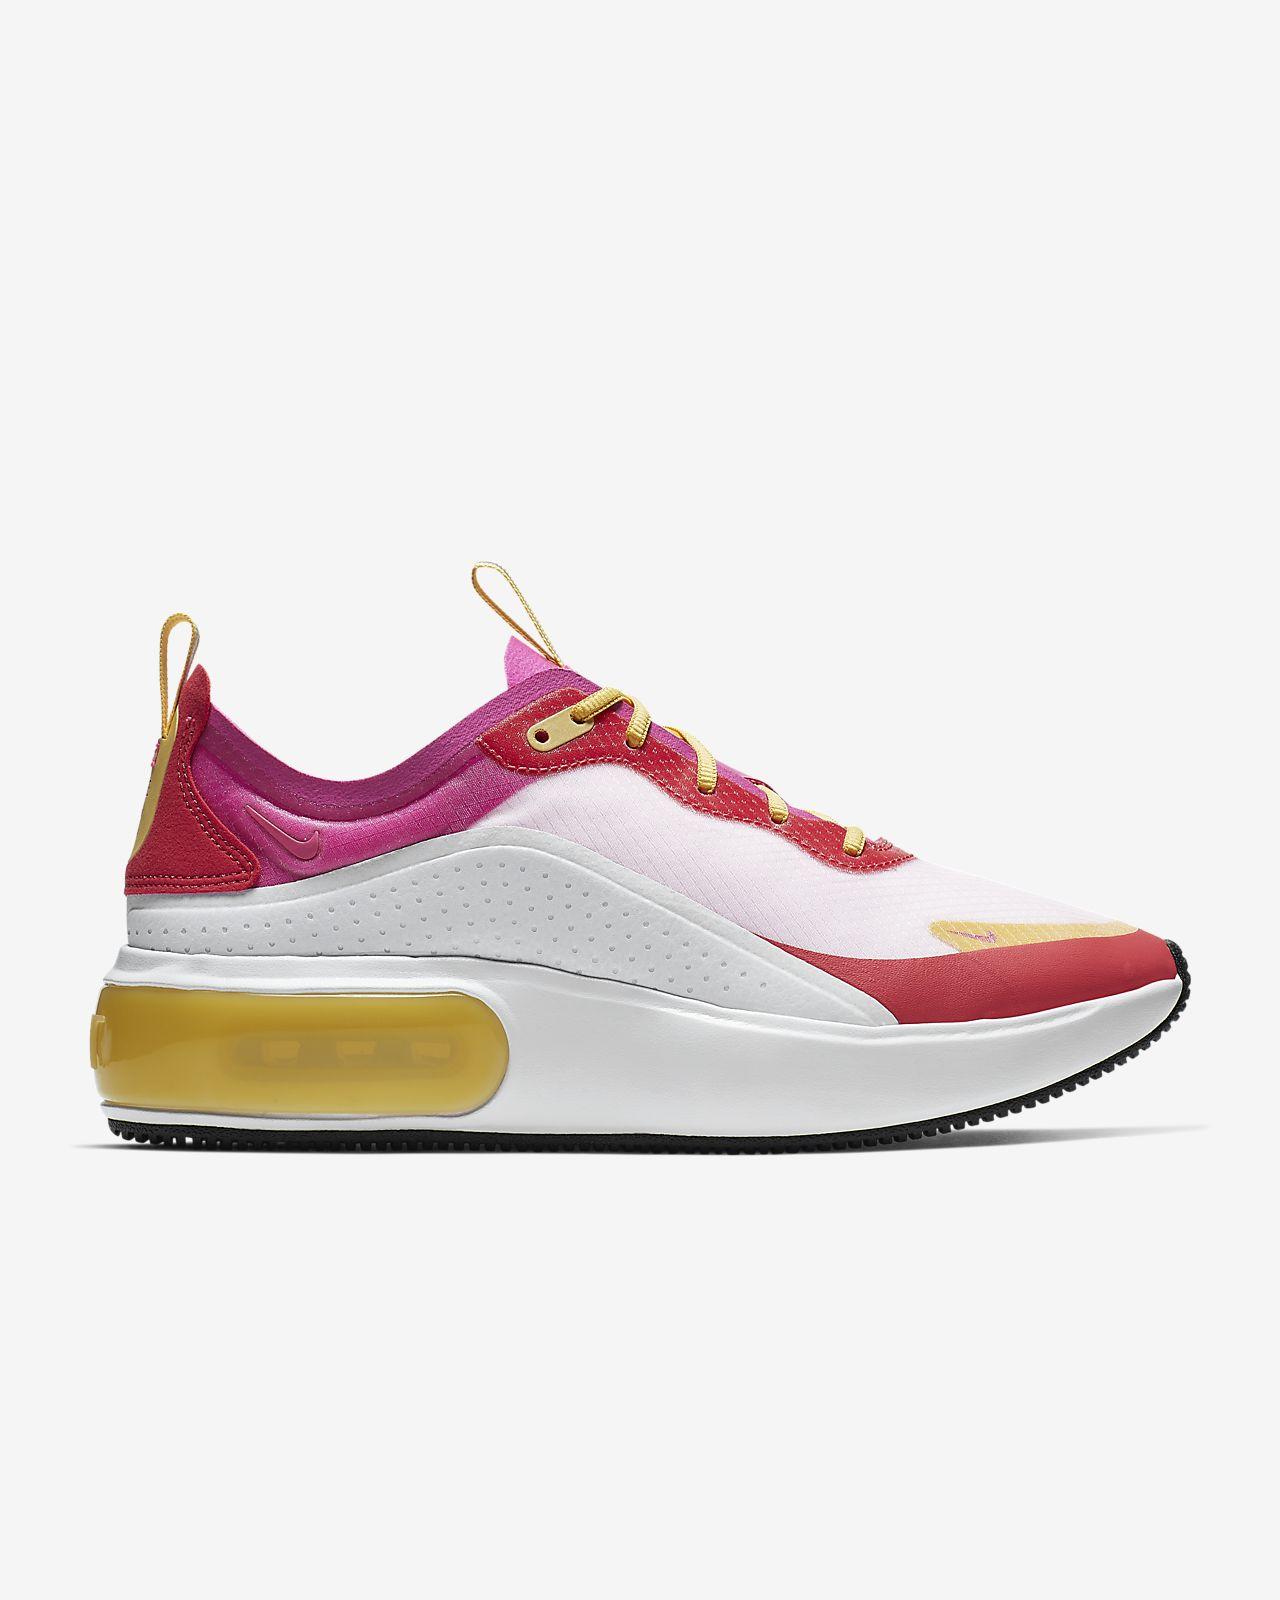 check out 634b0 07c79 ... Nike Air Max Dia SE Shoe